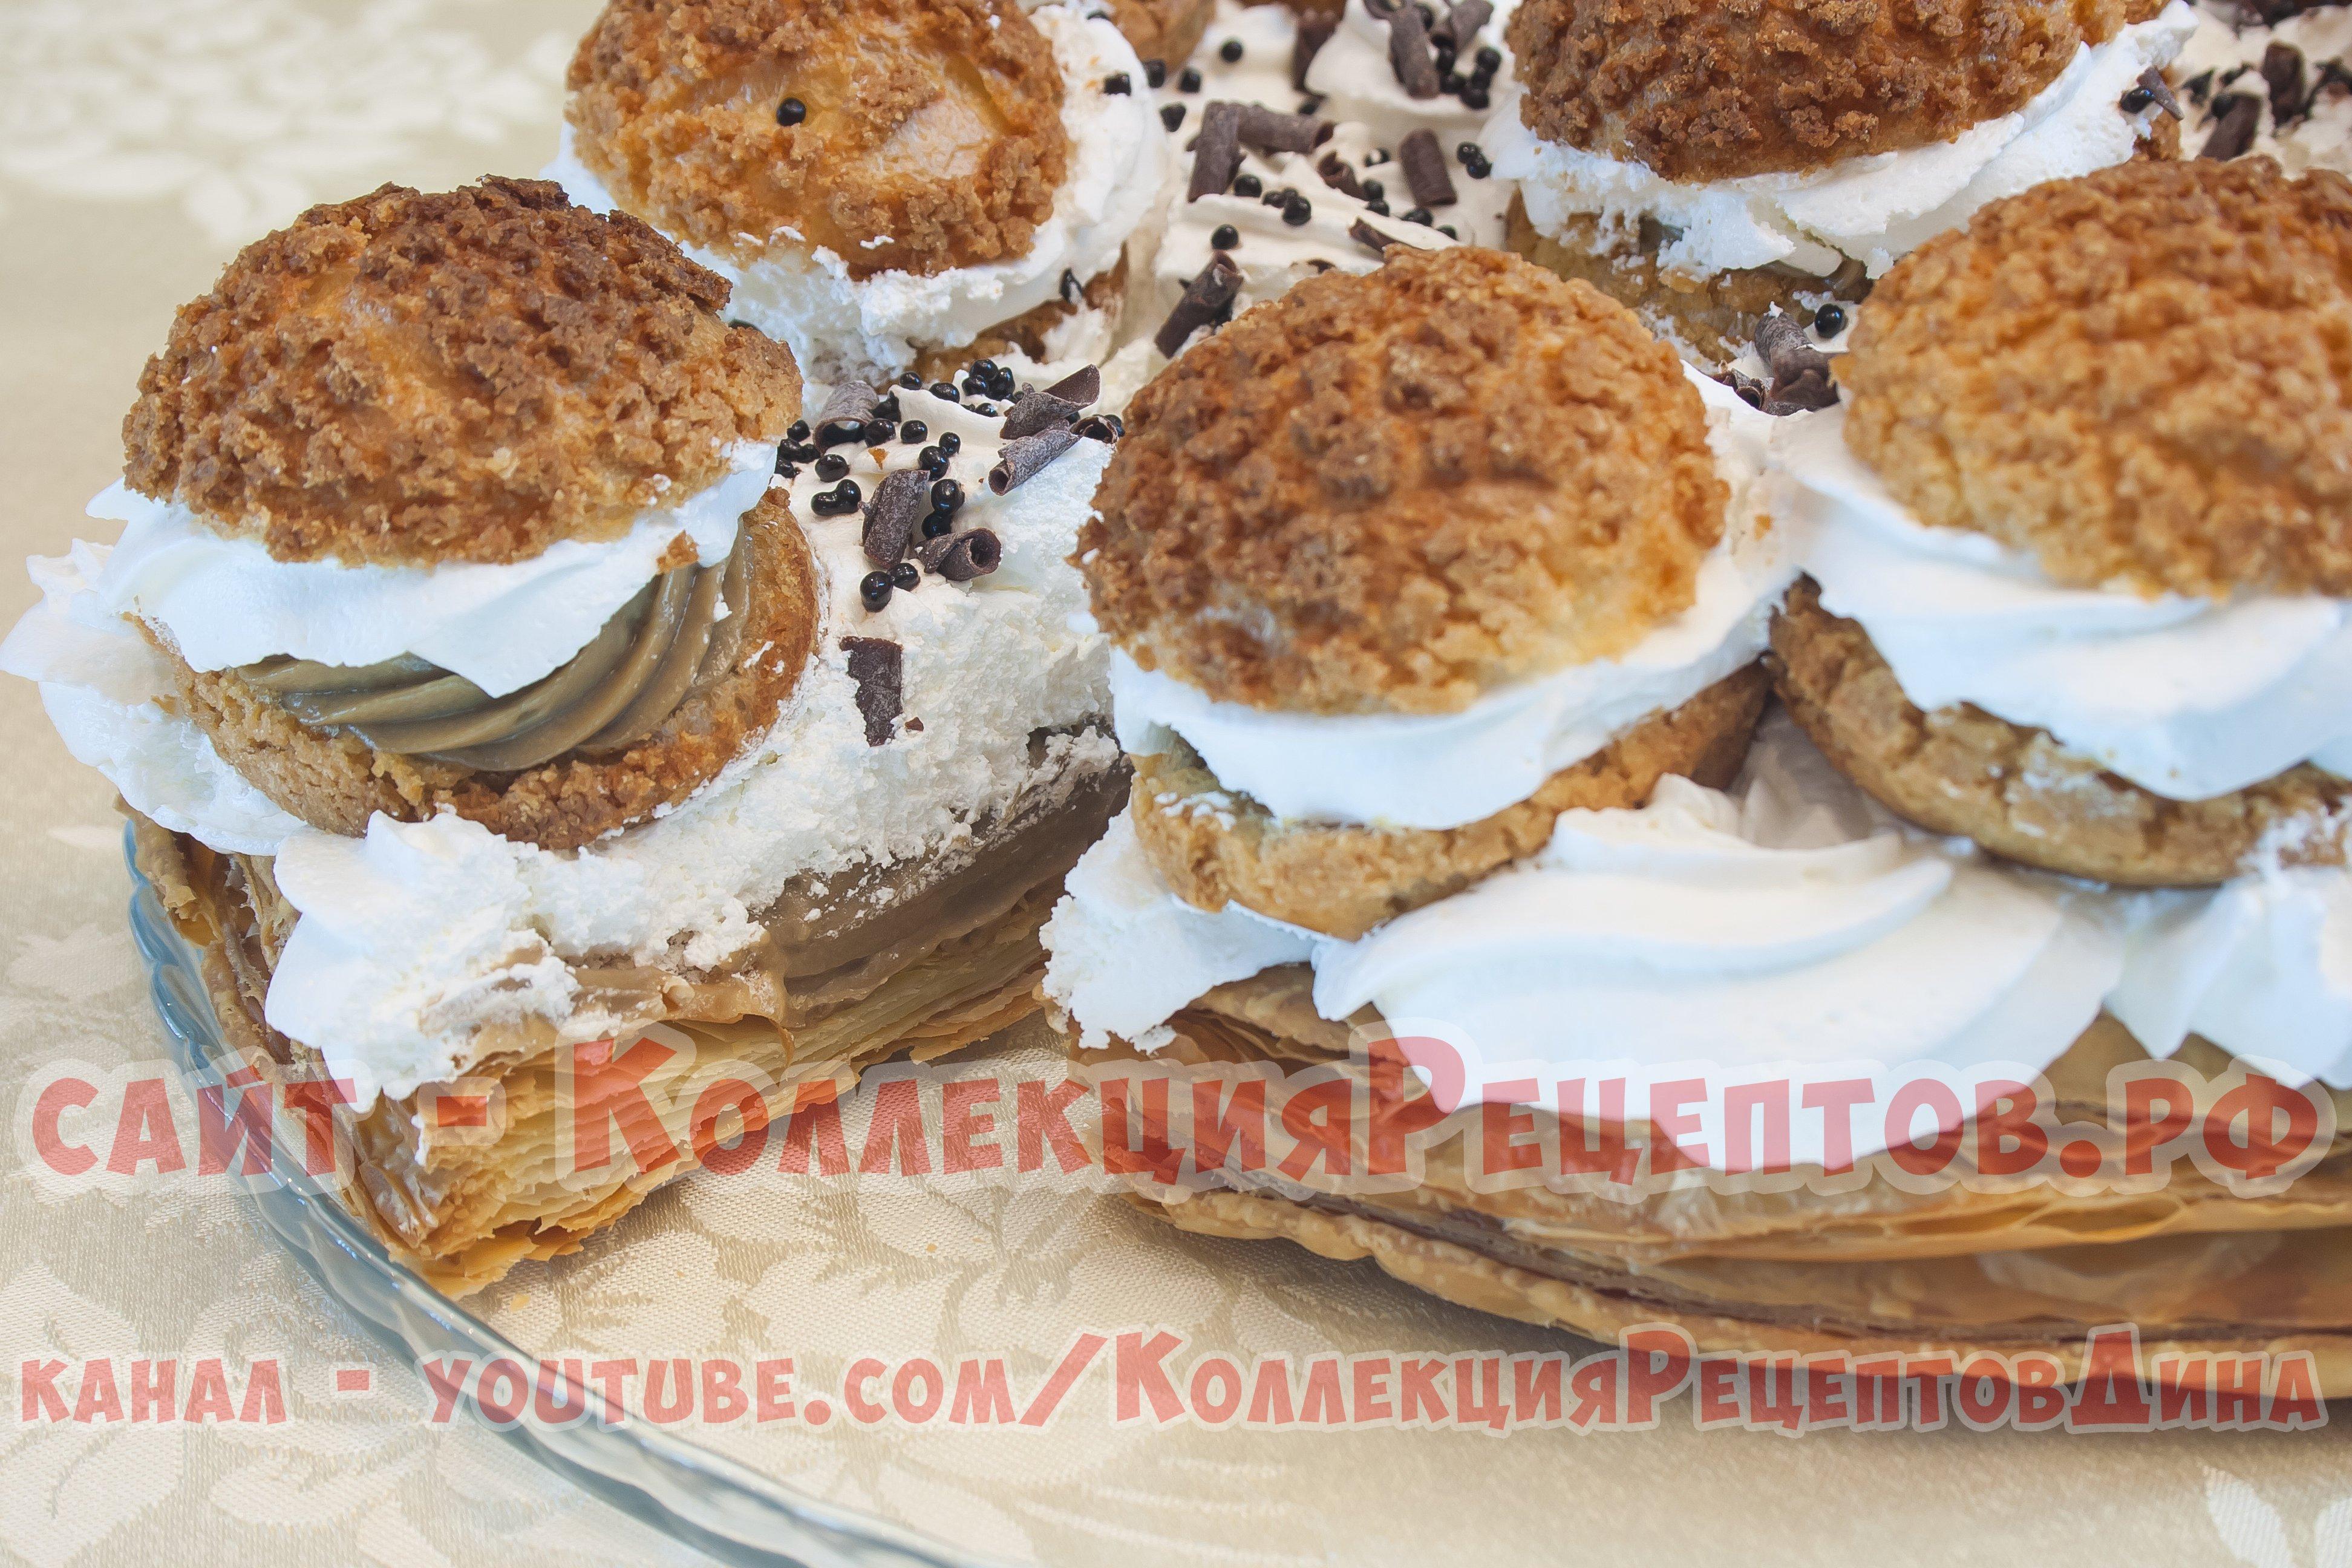 Торт Сент Оноре: рецепт с фото на Все о десертах 49